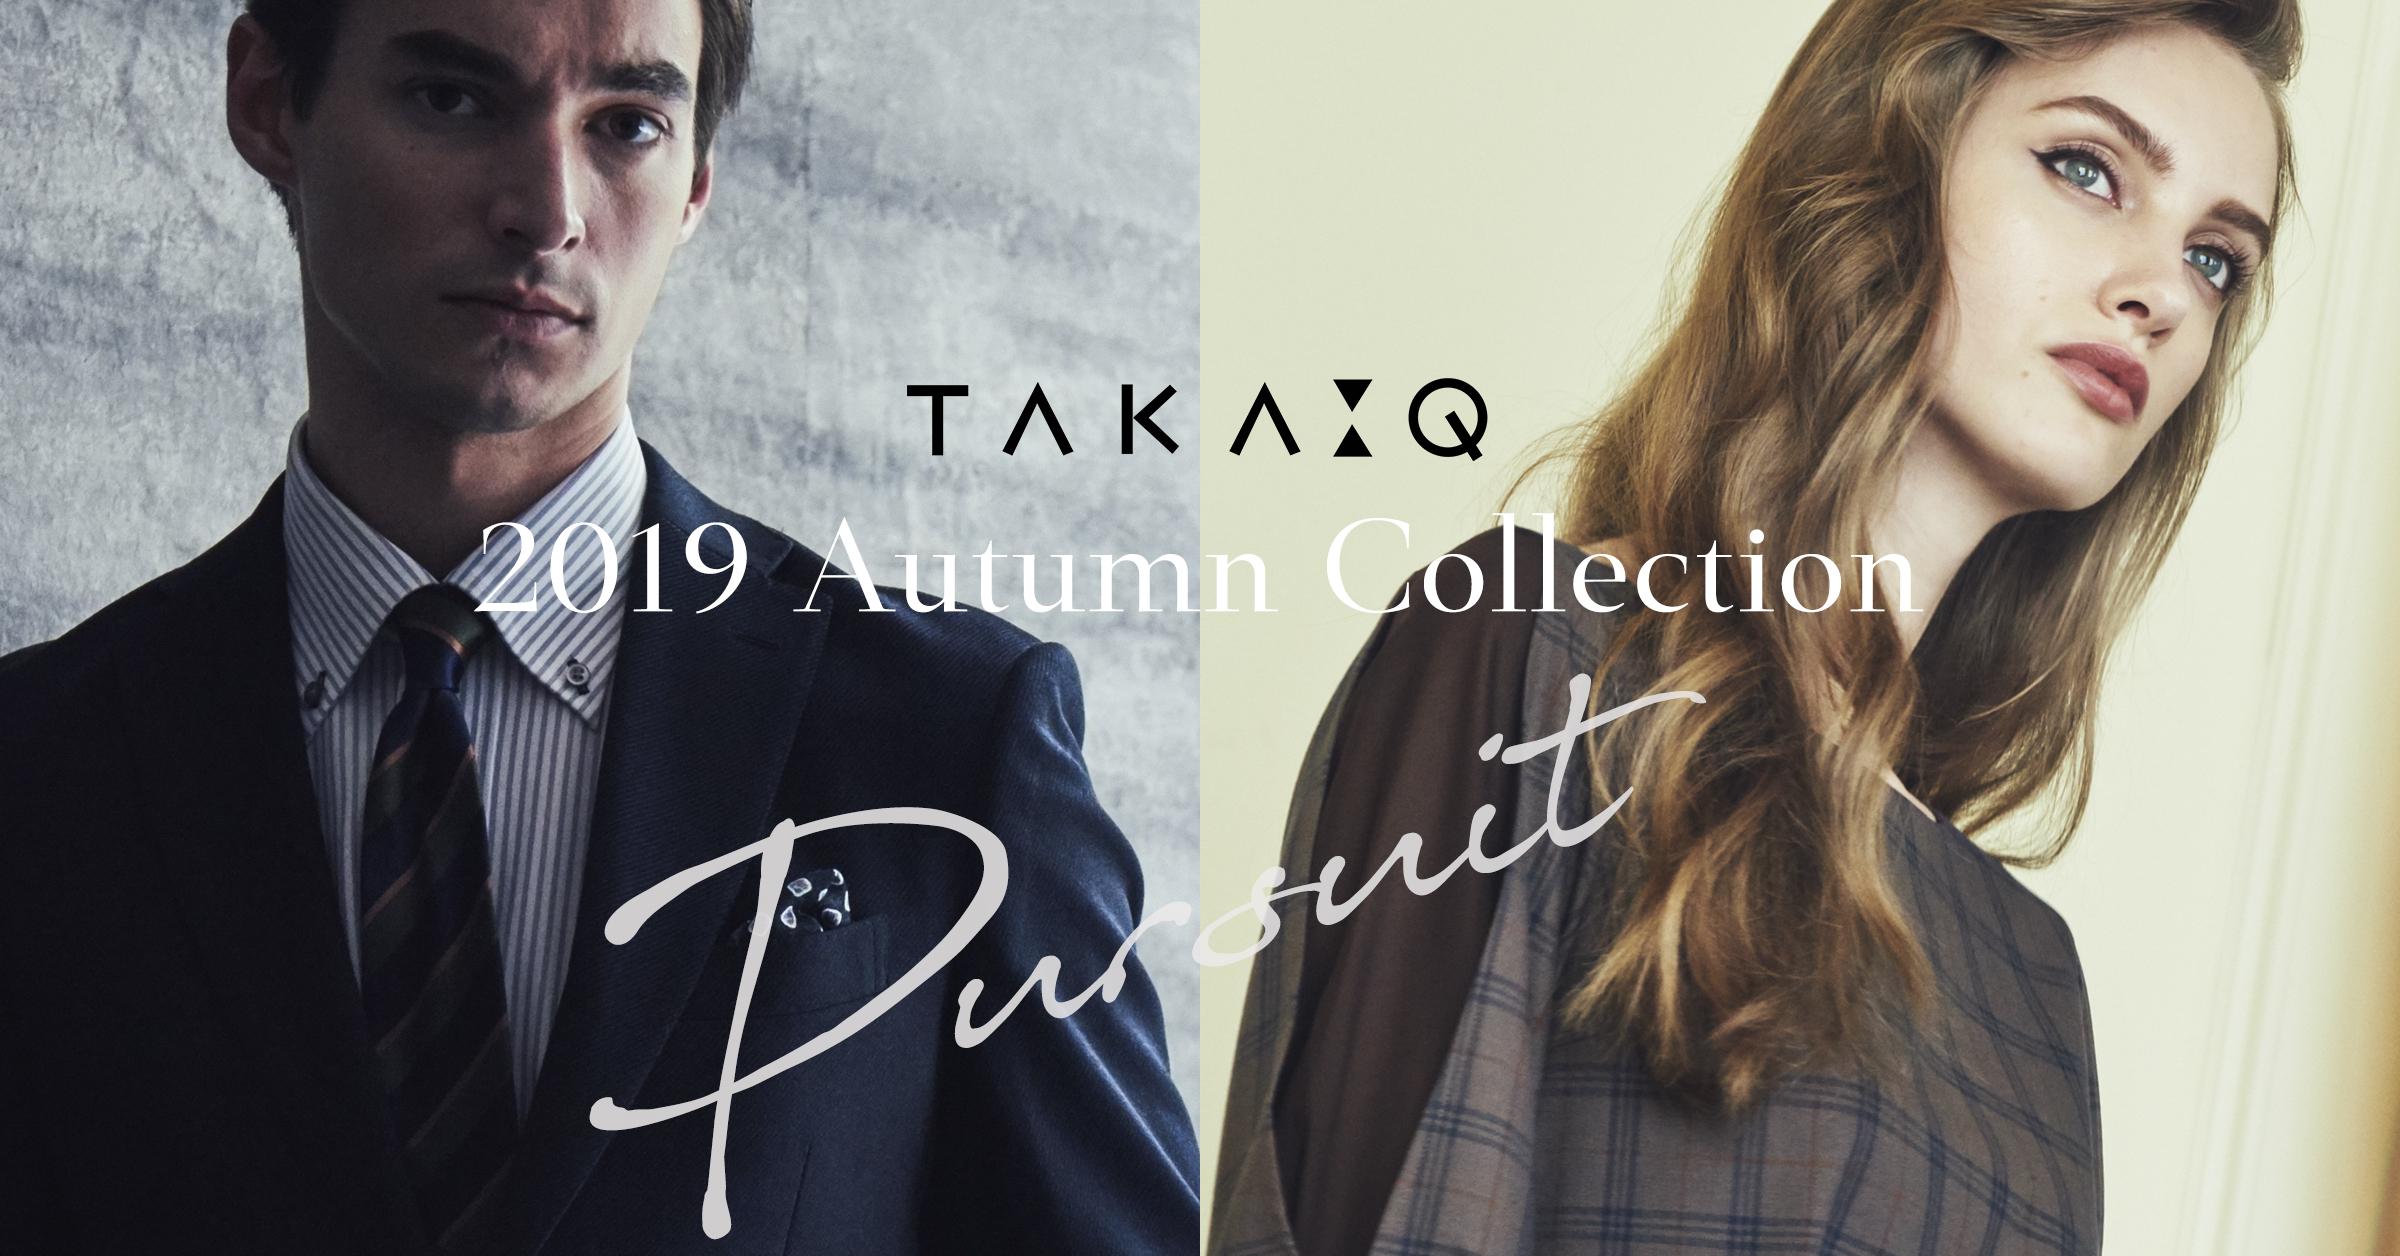 TAKA-Q 2019 AUTUMN COLLECTION